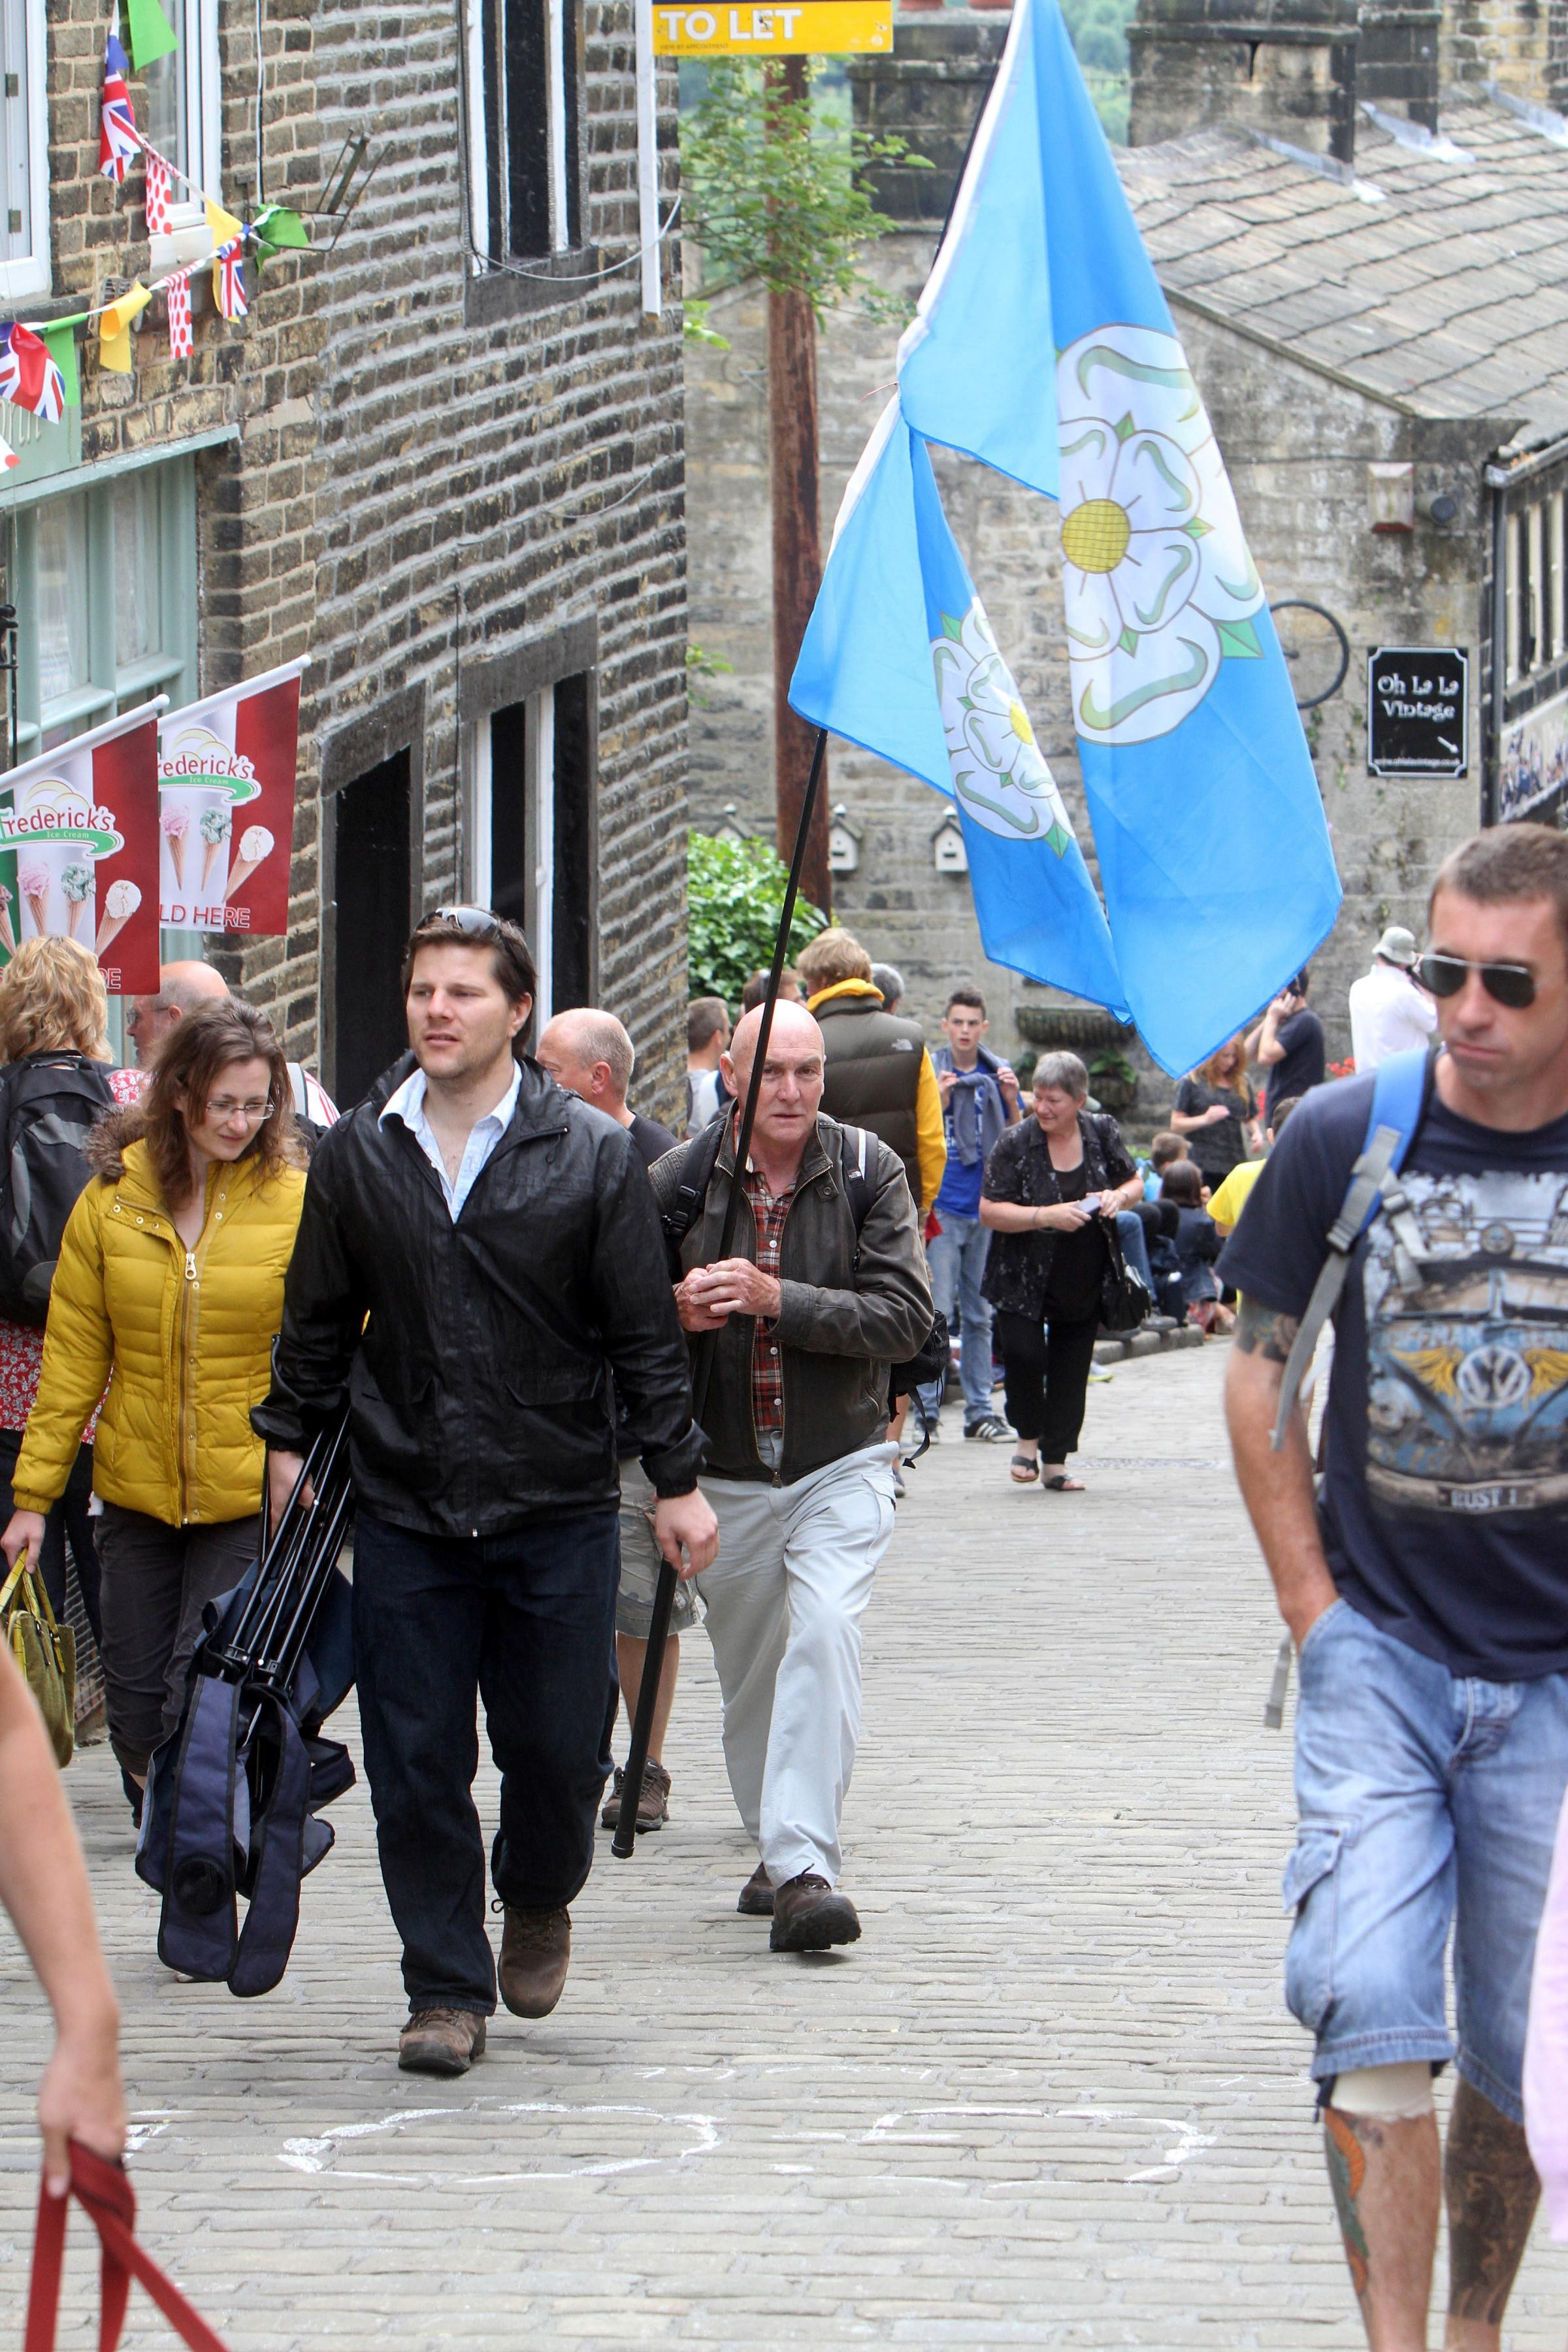 Yorkshire Day celebrations get underway across the Bradford district